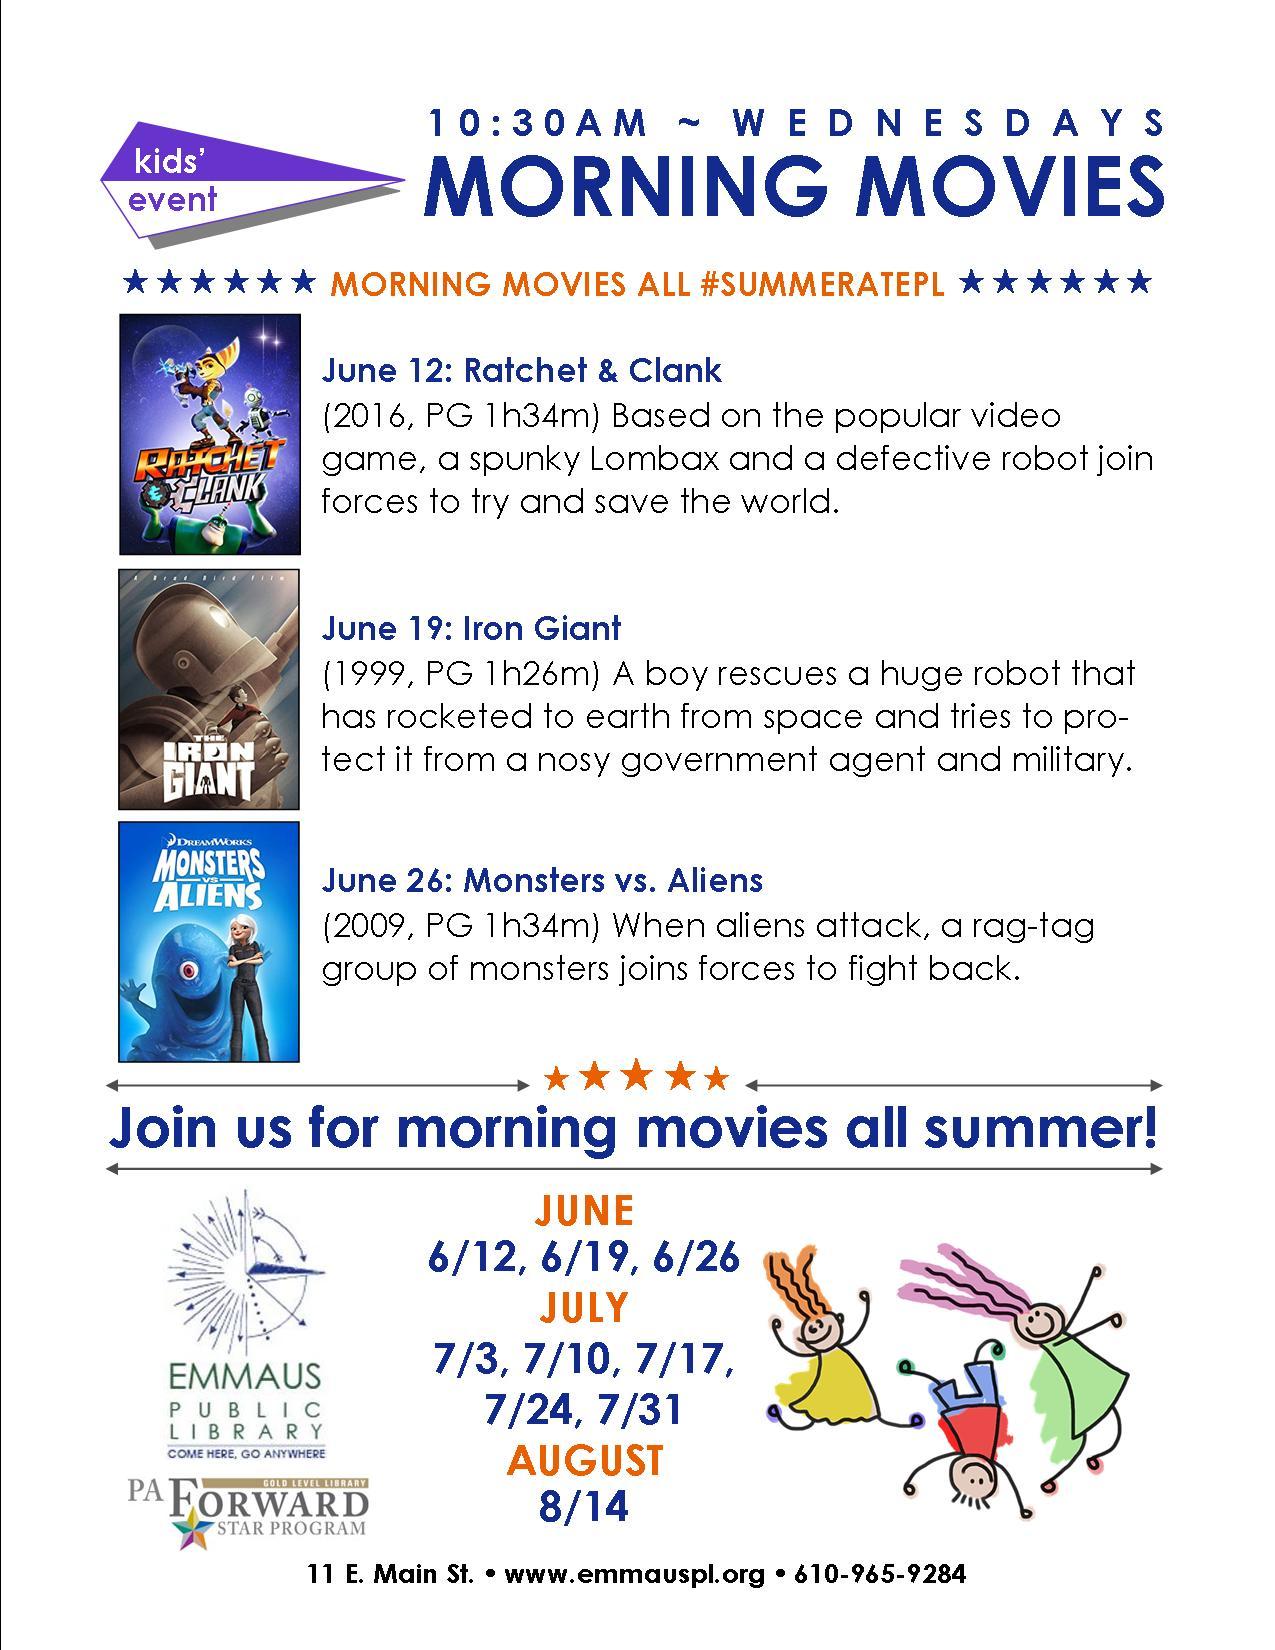 Summer Storytime and Movie Series start this week! - Emmaus